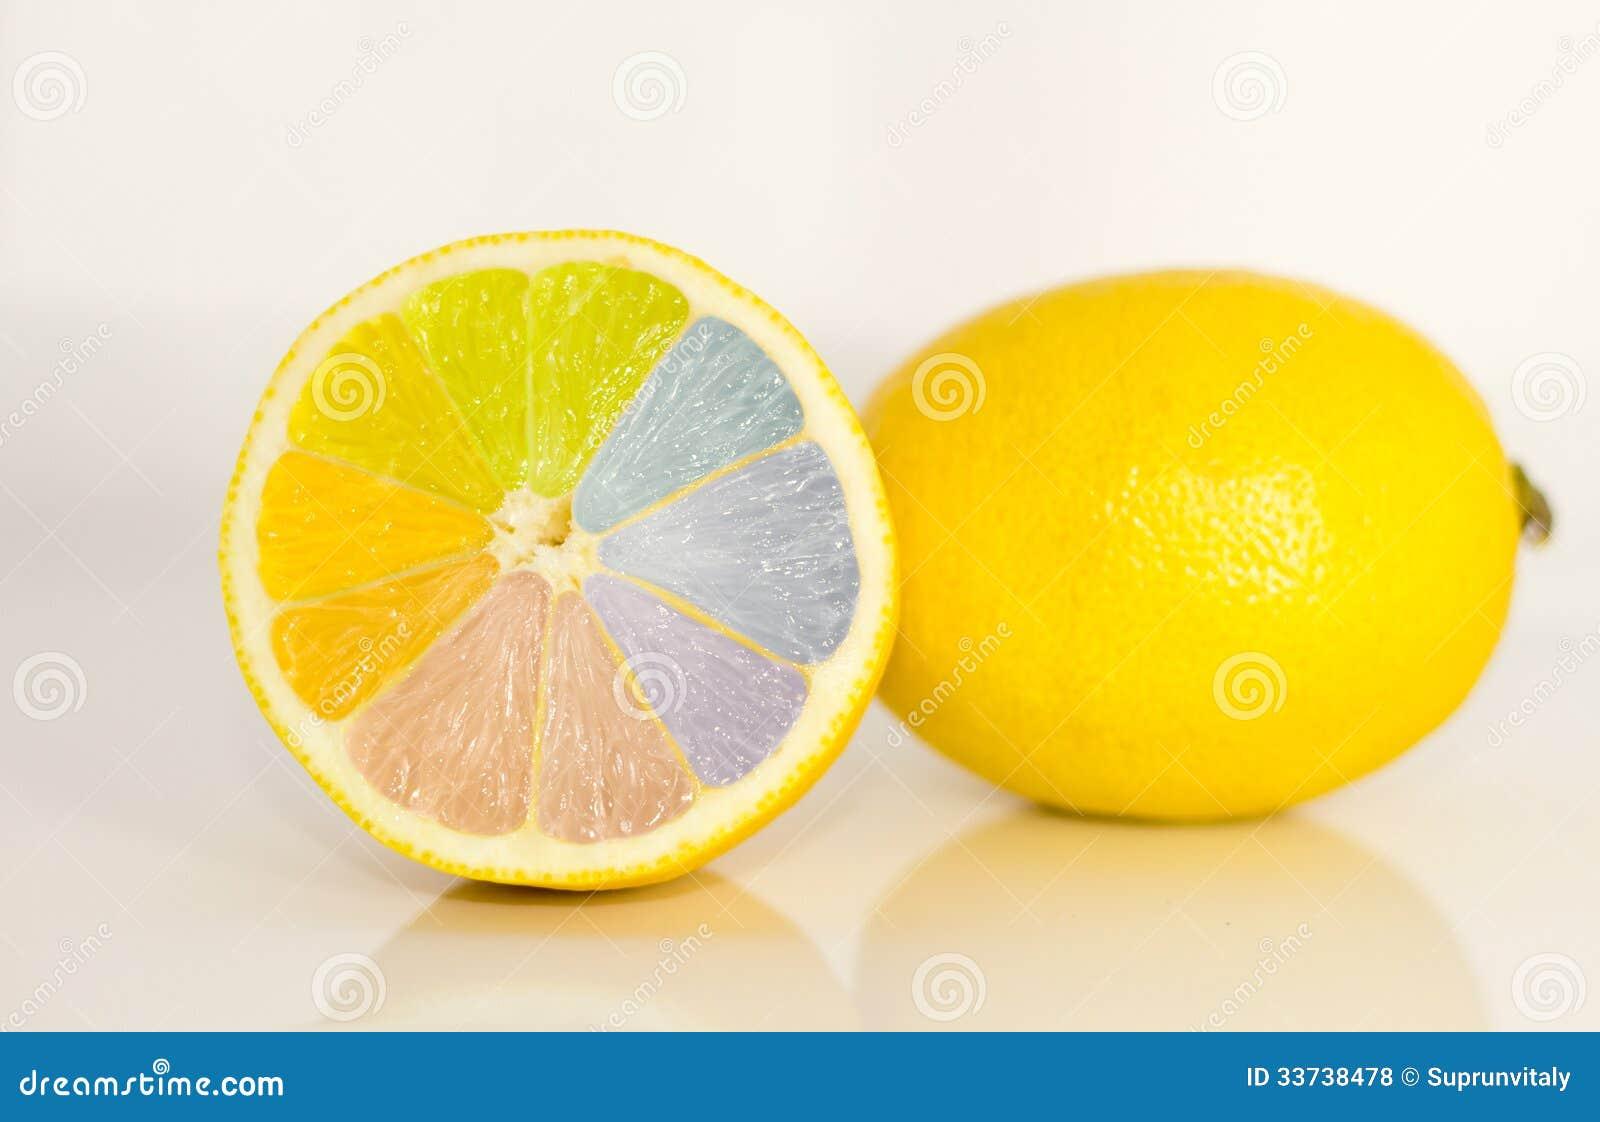 Радуга на лимоне